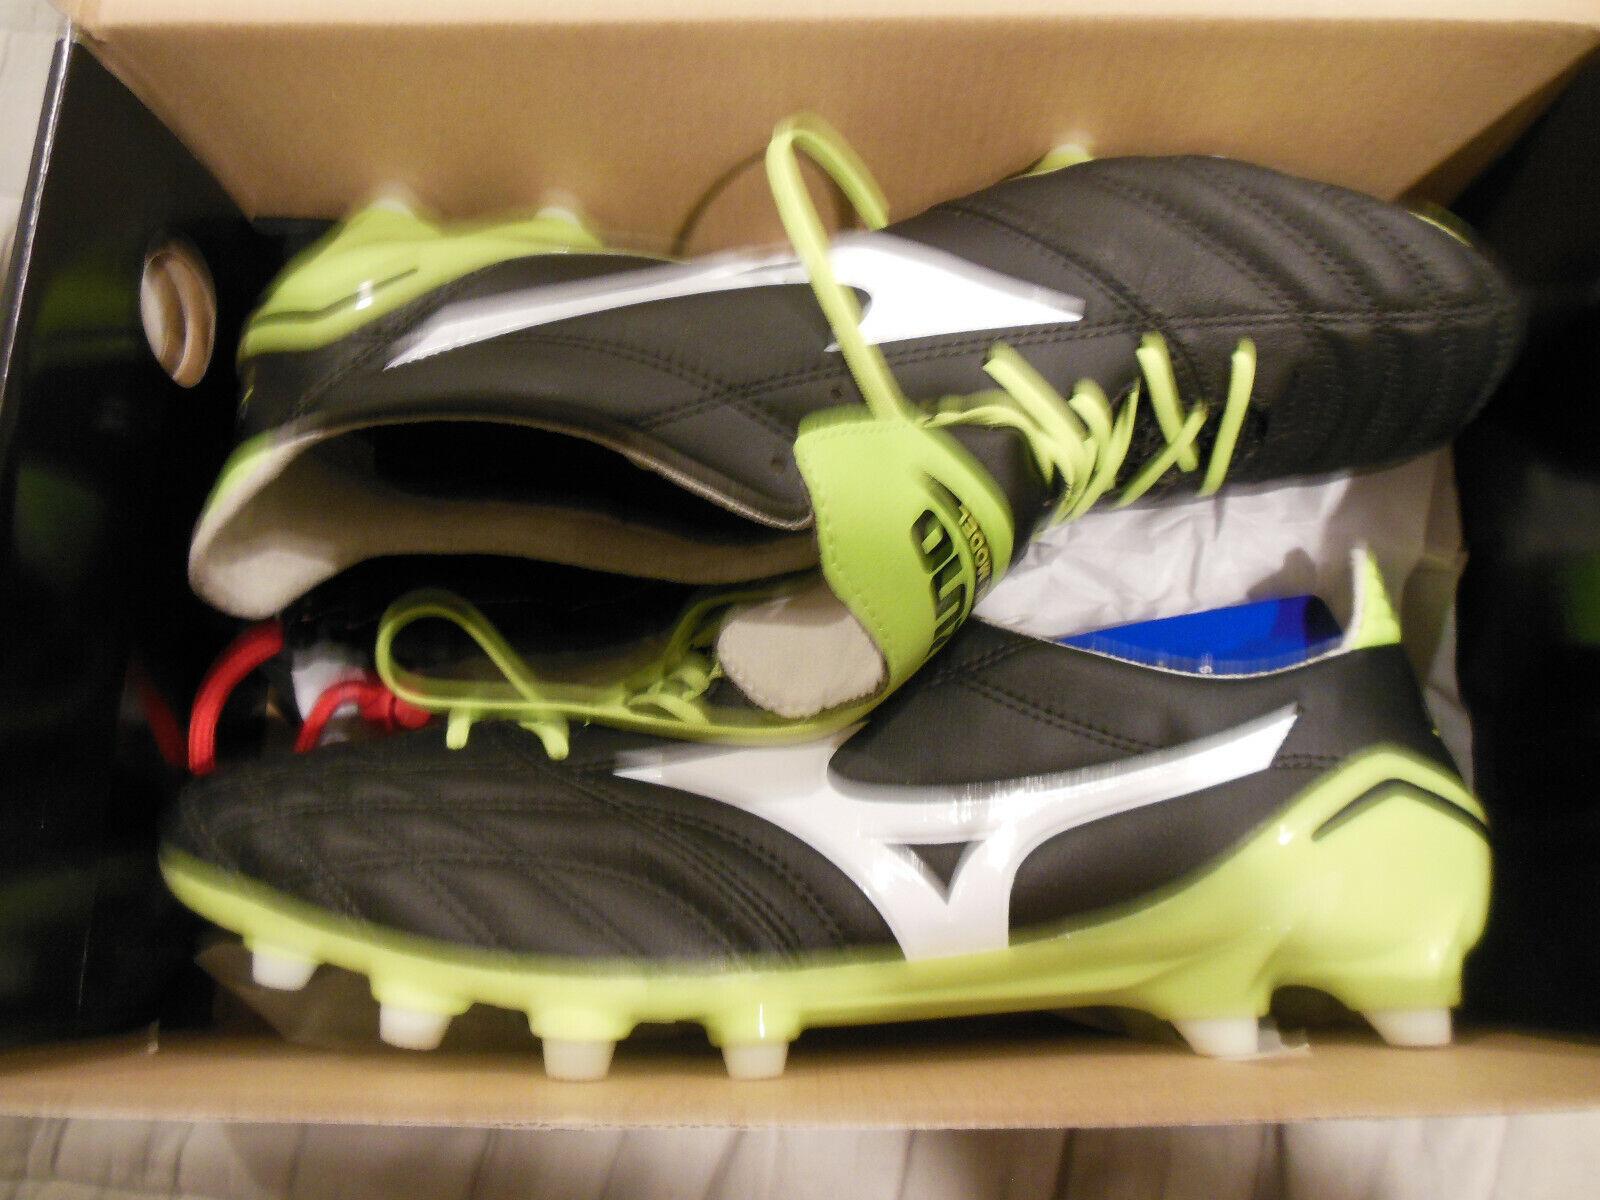 Mizuno Morelia Neo Black and Green Soccer Cleats.